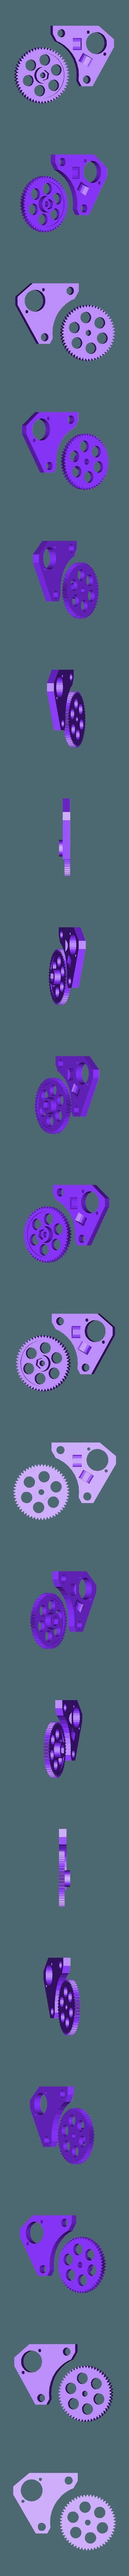 Tray-8.stl Download free STL file RepRapPro Mendel Trays • 3D printable model, Nessun_Dorma